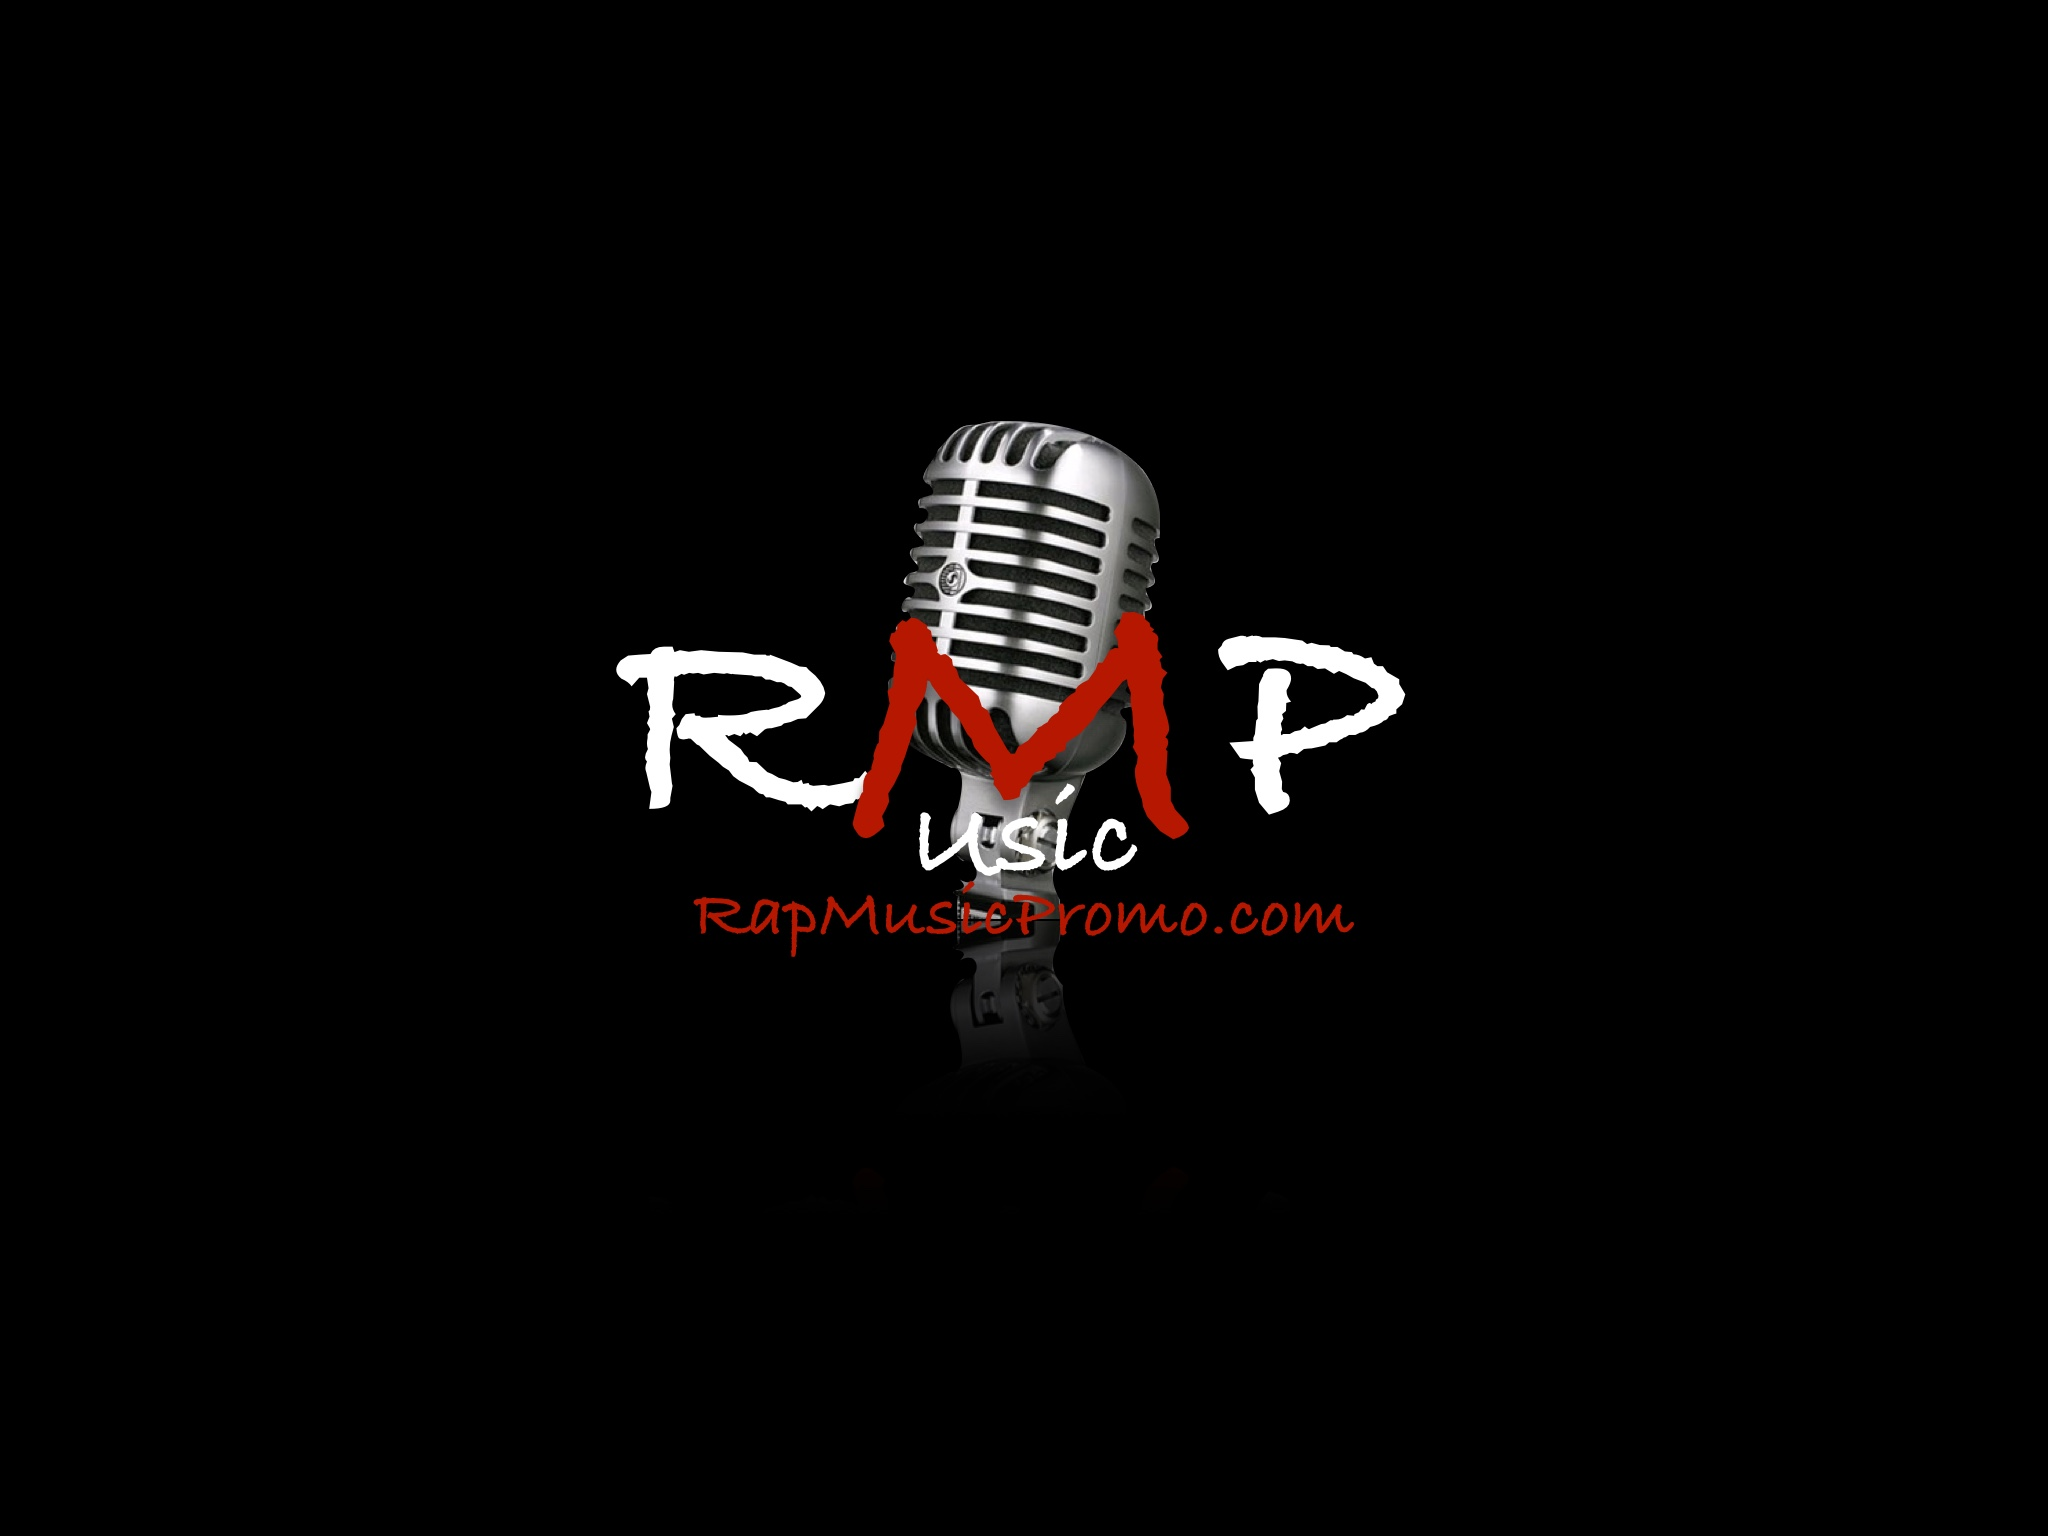 RapMusicPromo.com